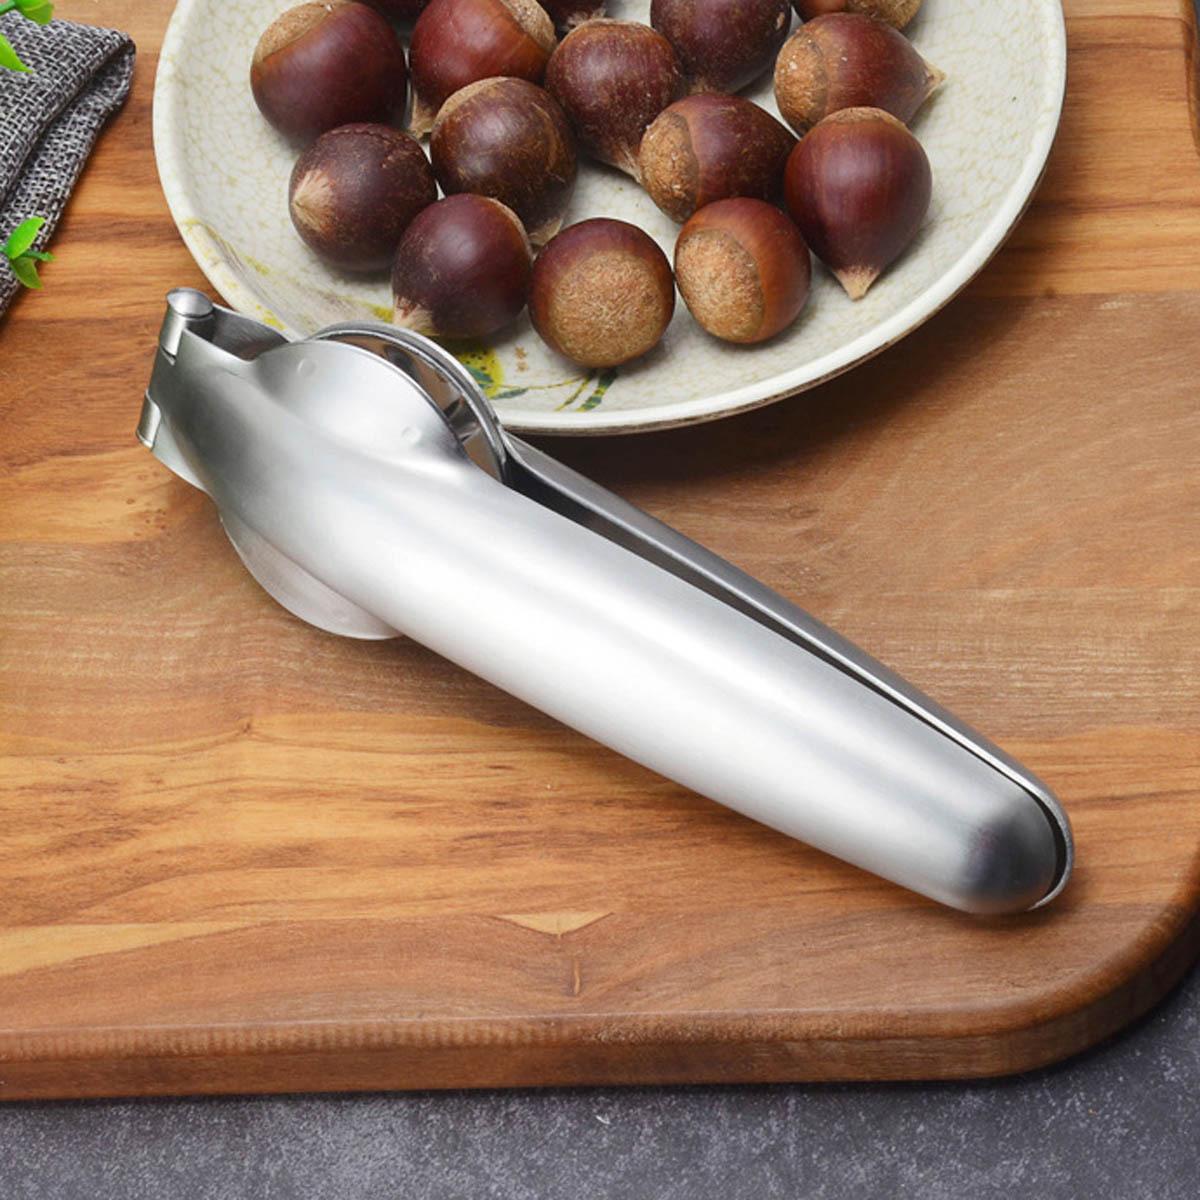 New Stainless Steel Walnut Opener 2 in 1 Quick Chestnut Clip Plier Sheller Chestnut Nut Cracker Multifunctional Kitchen Tools